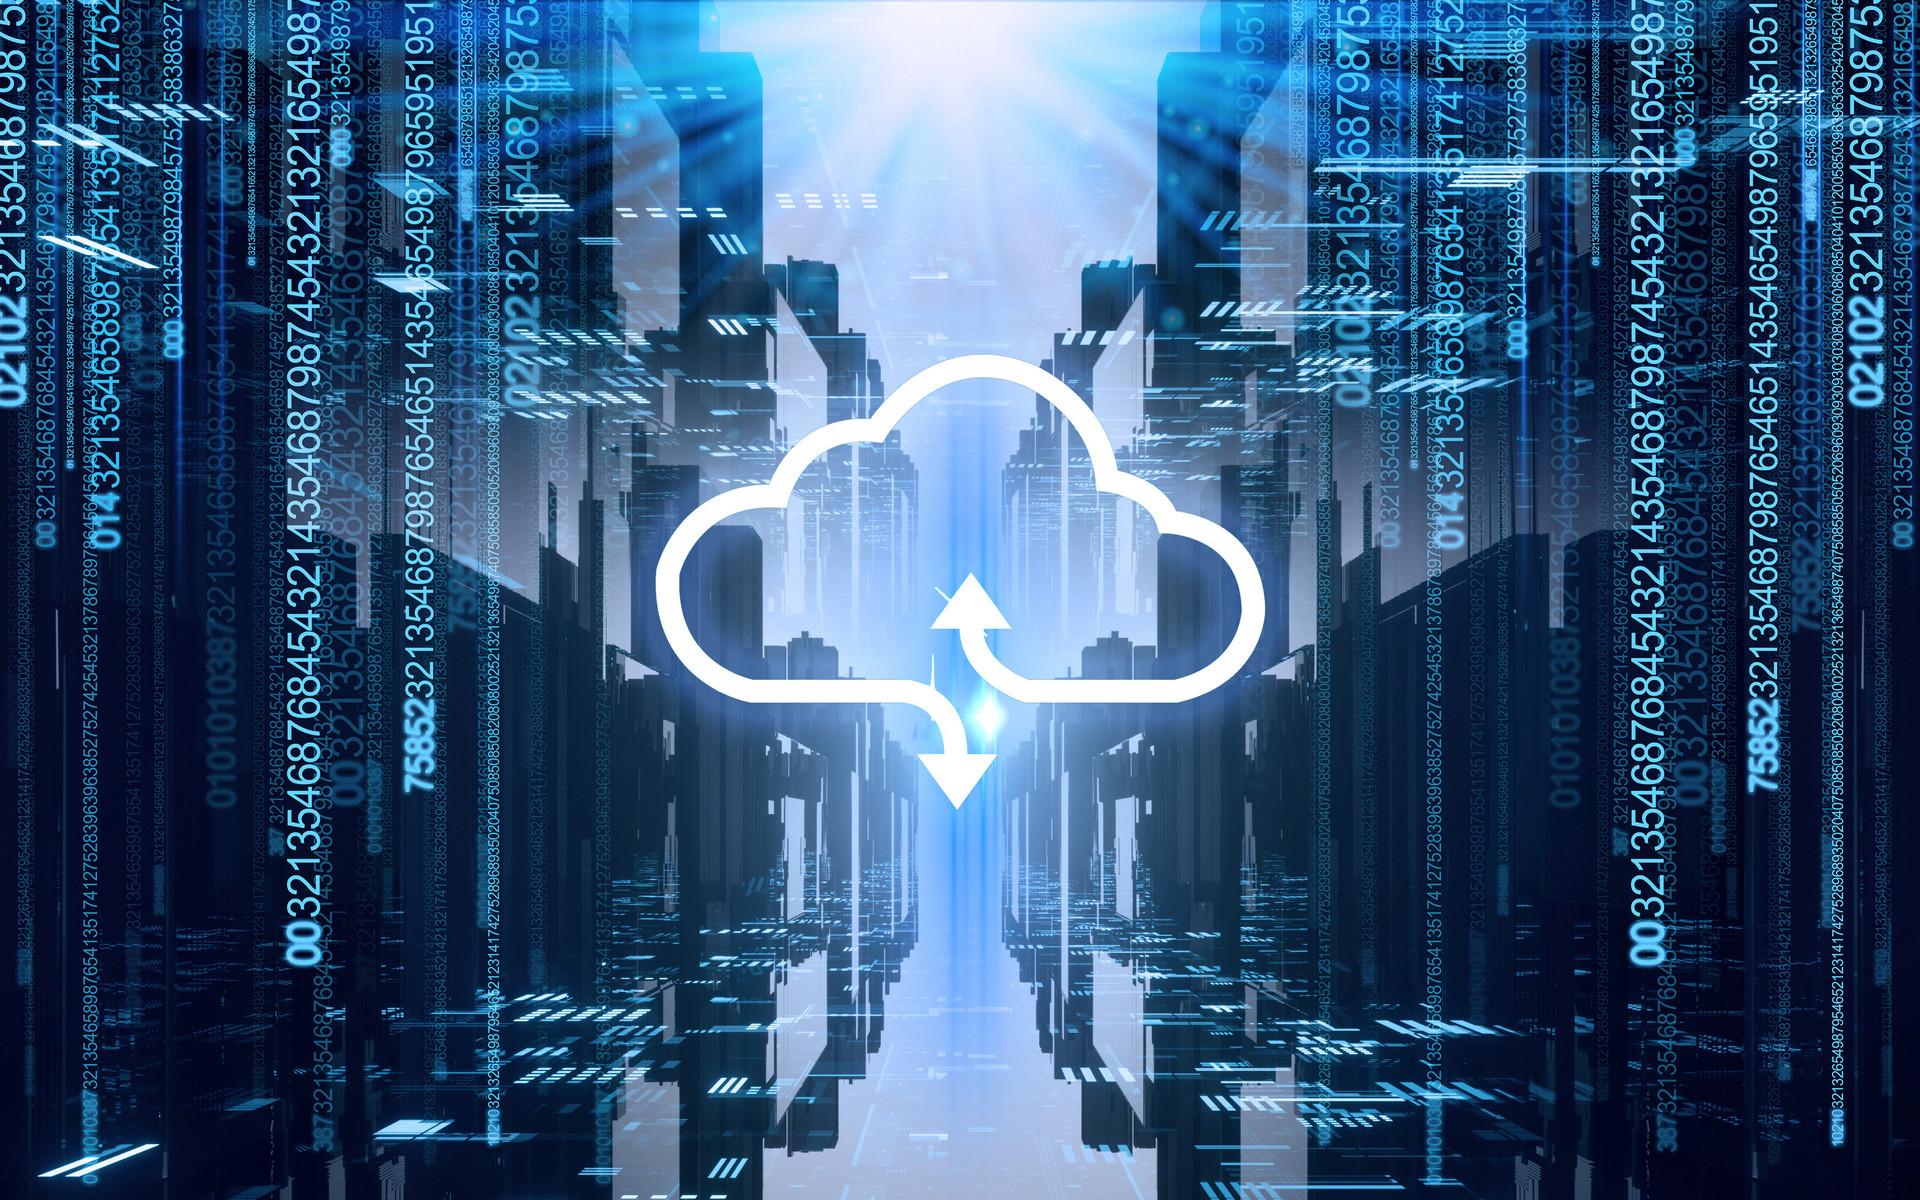 Microchip发布首款包含开源工具包的Adaptec智能存储解决方案,用于数据中心存储管理